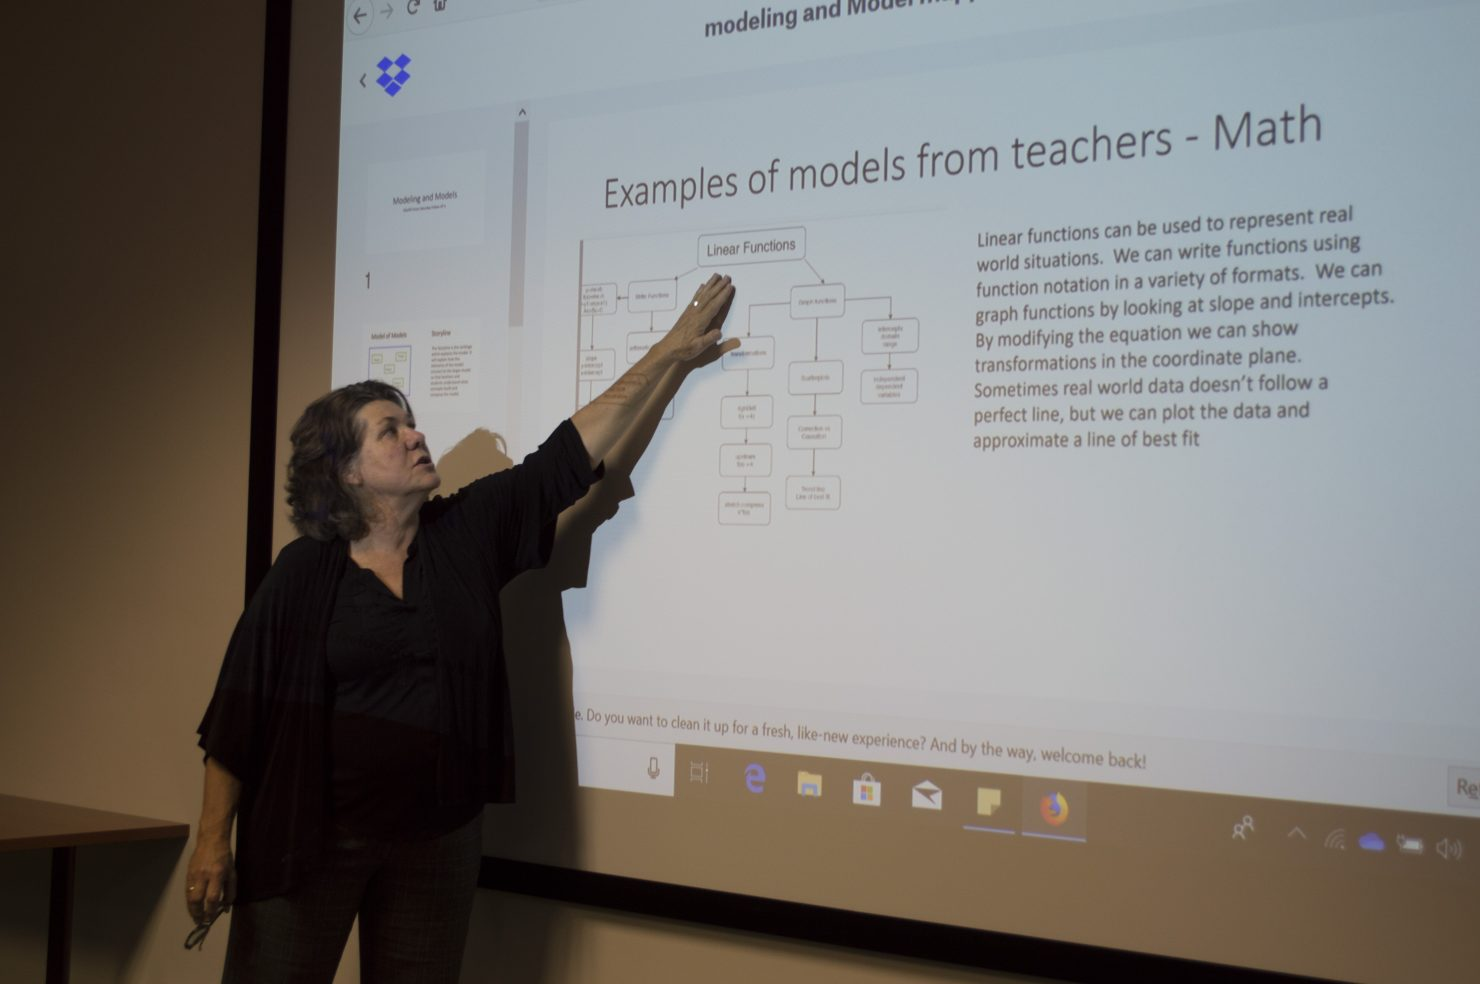 Nancy J. Ruzycki, Ph.D. leads session at UF Professional Development Workshop for STEM Teachers